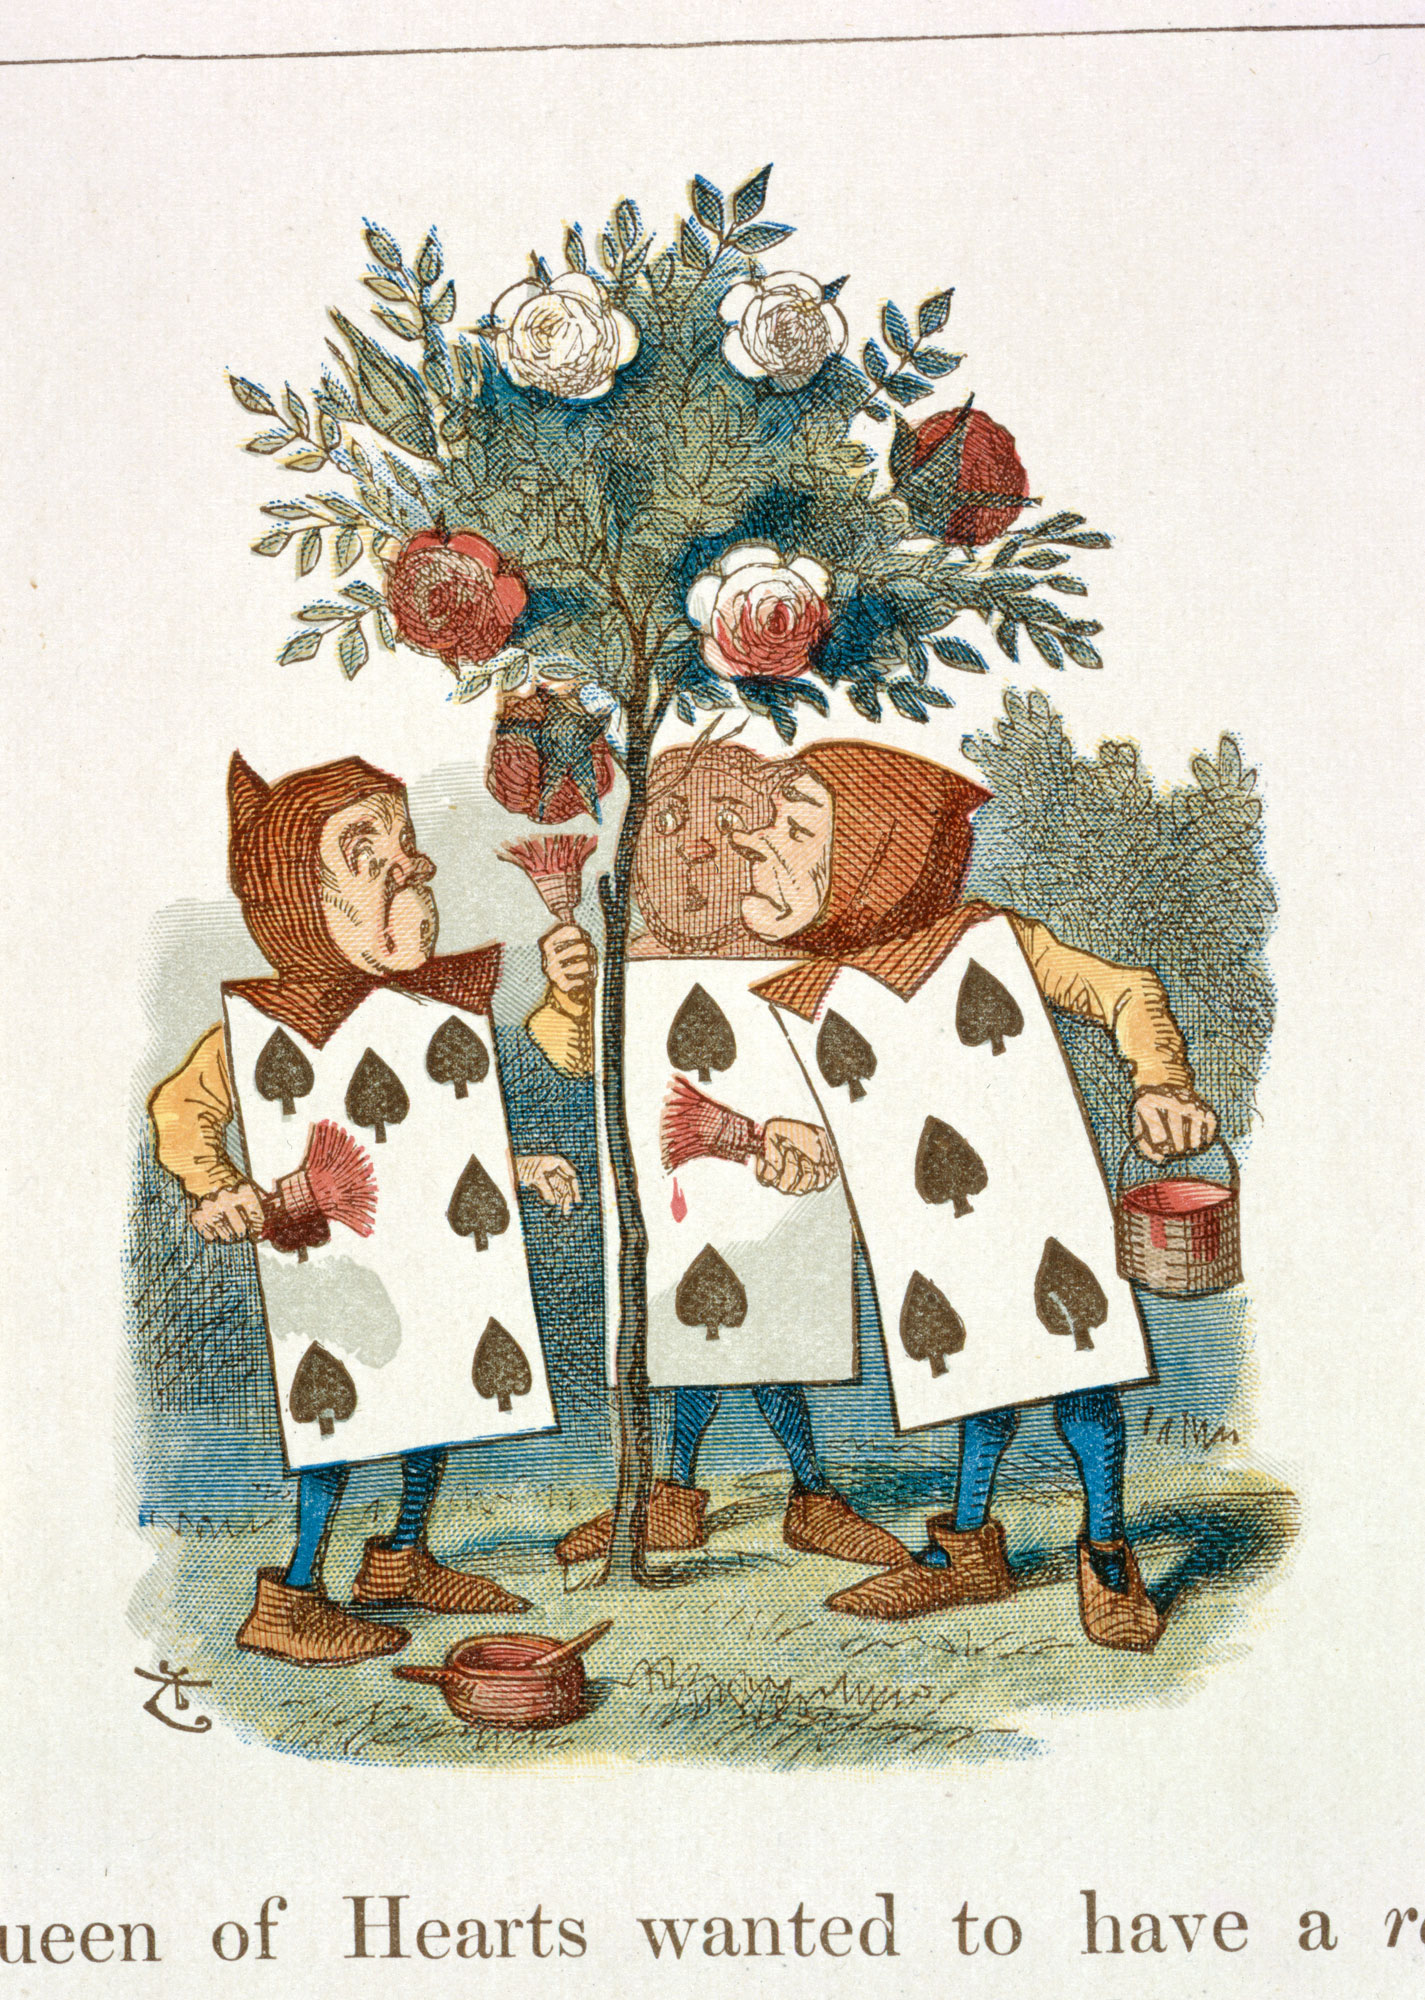 Drawn rose bush alice in wonderland card Eighth Illustration to Bushes' to